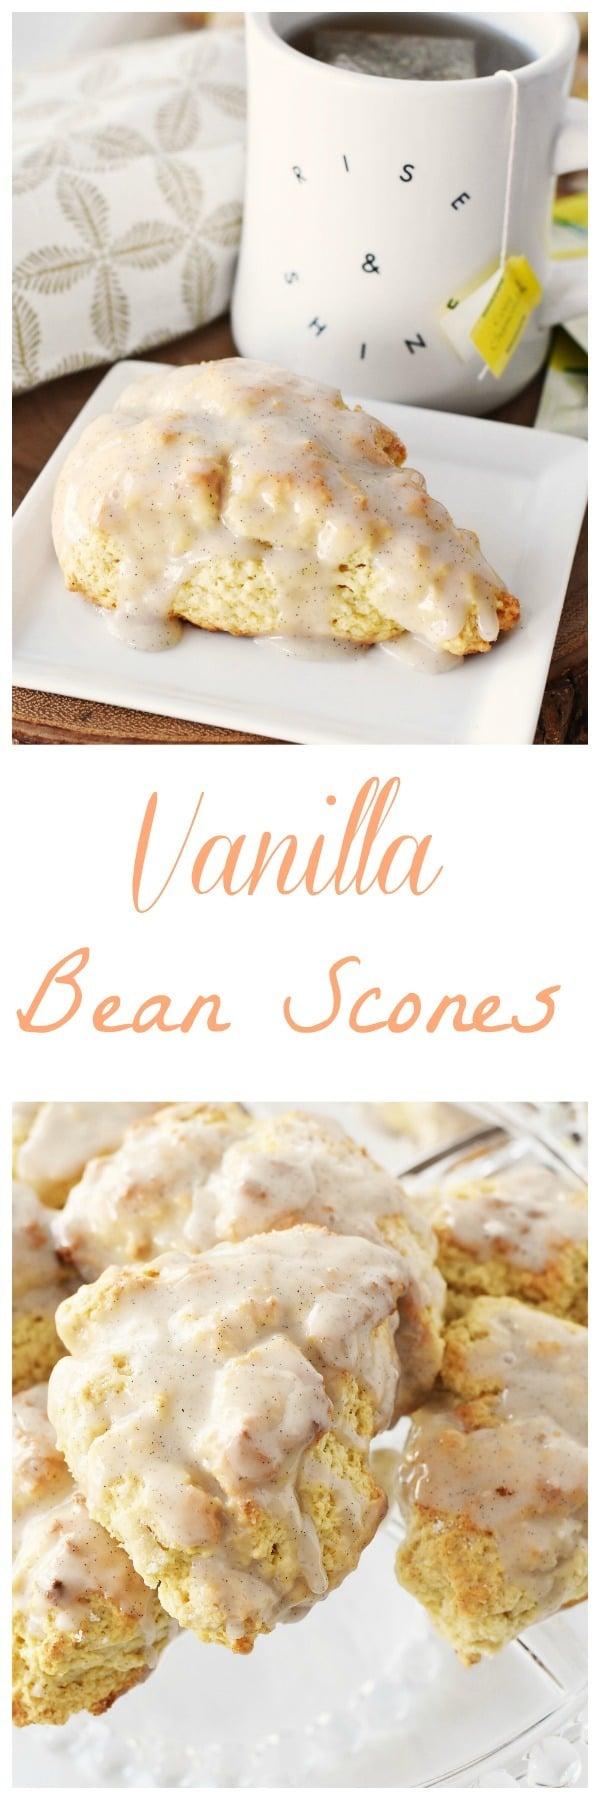 vanilla-bean-scones-pin